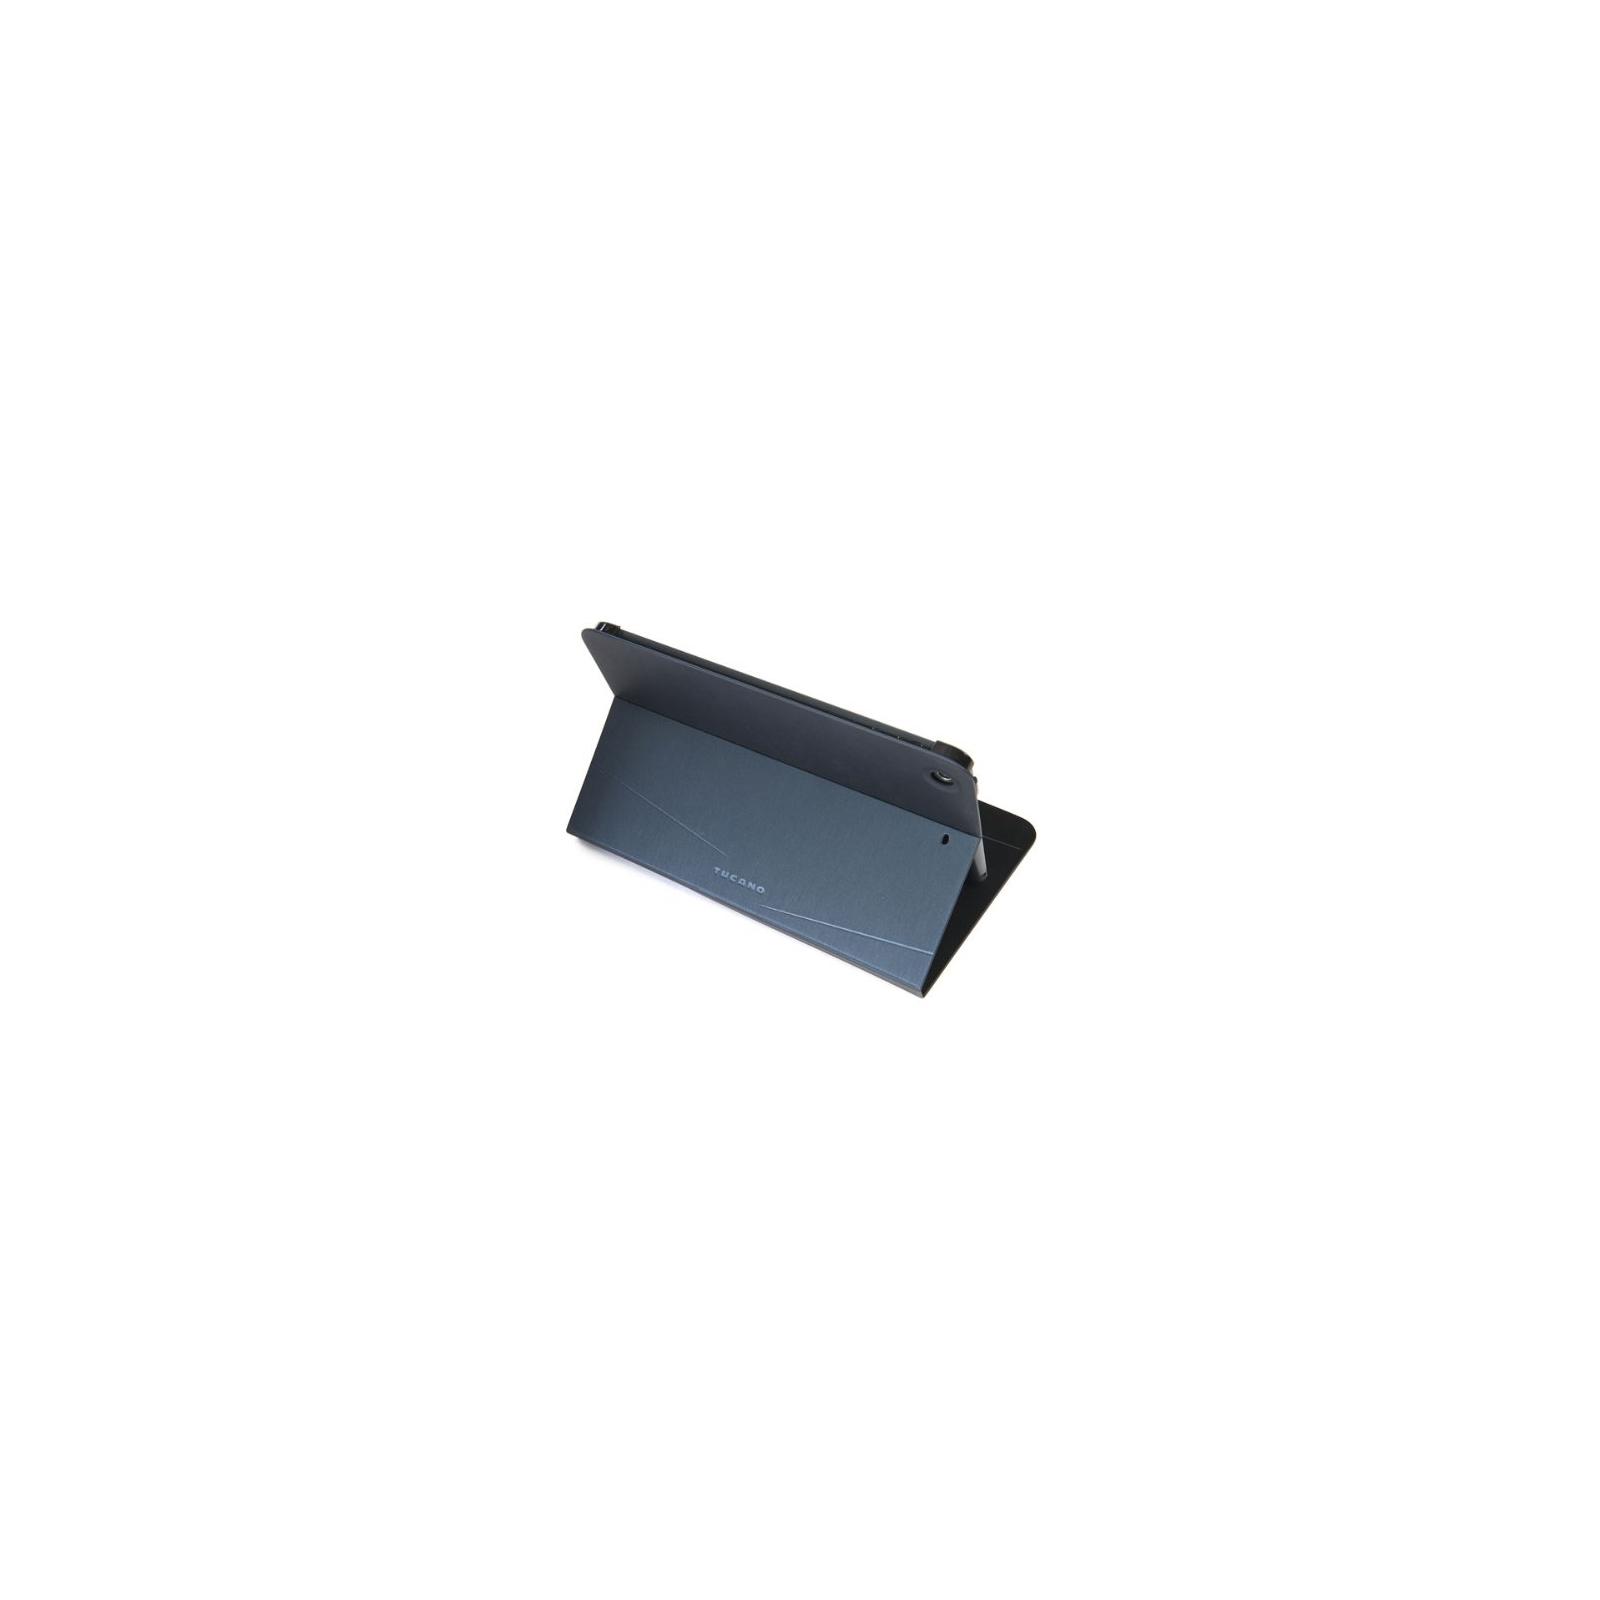 Чехол для планшета Tucano iPad Air Filo Blue (IPD5FI-BS) изображение 5